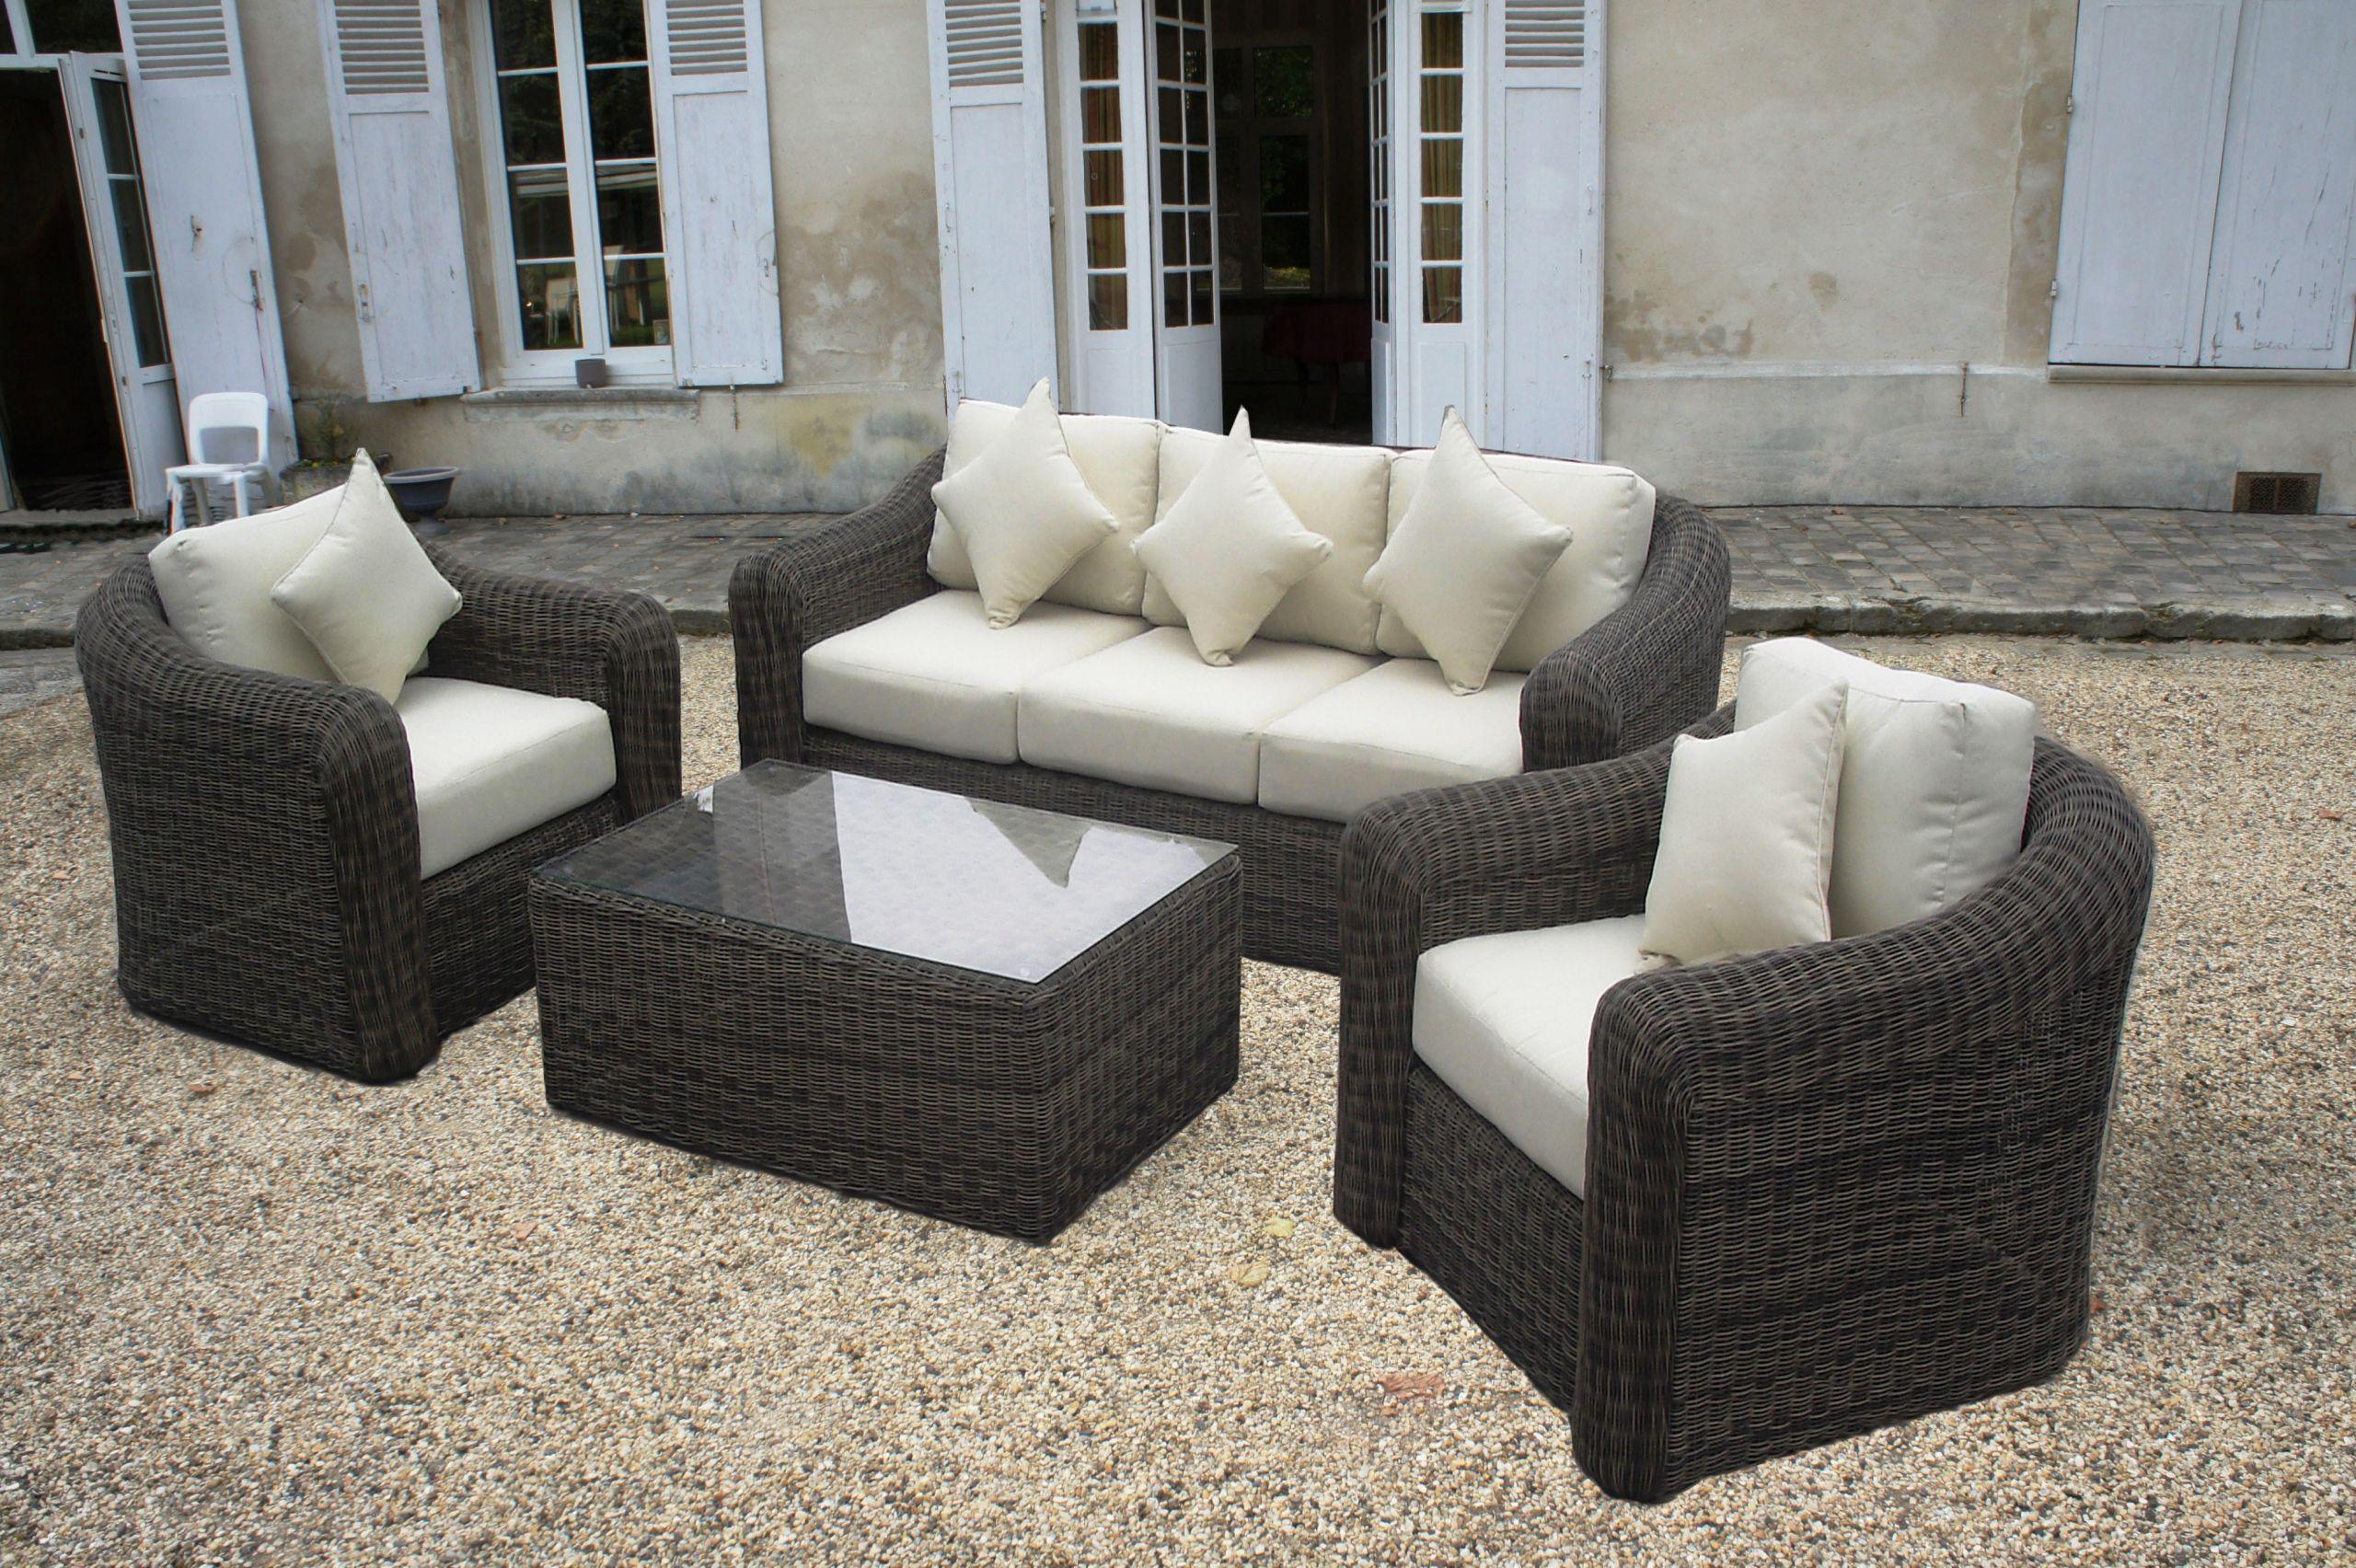 Salon De Jardin Design En Solde Concept - Idees Conception ... pour Salon De Jardin En Soldes